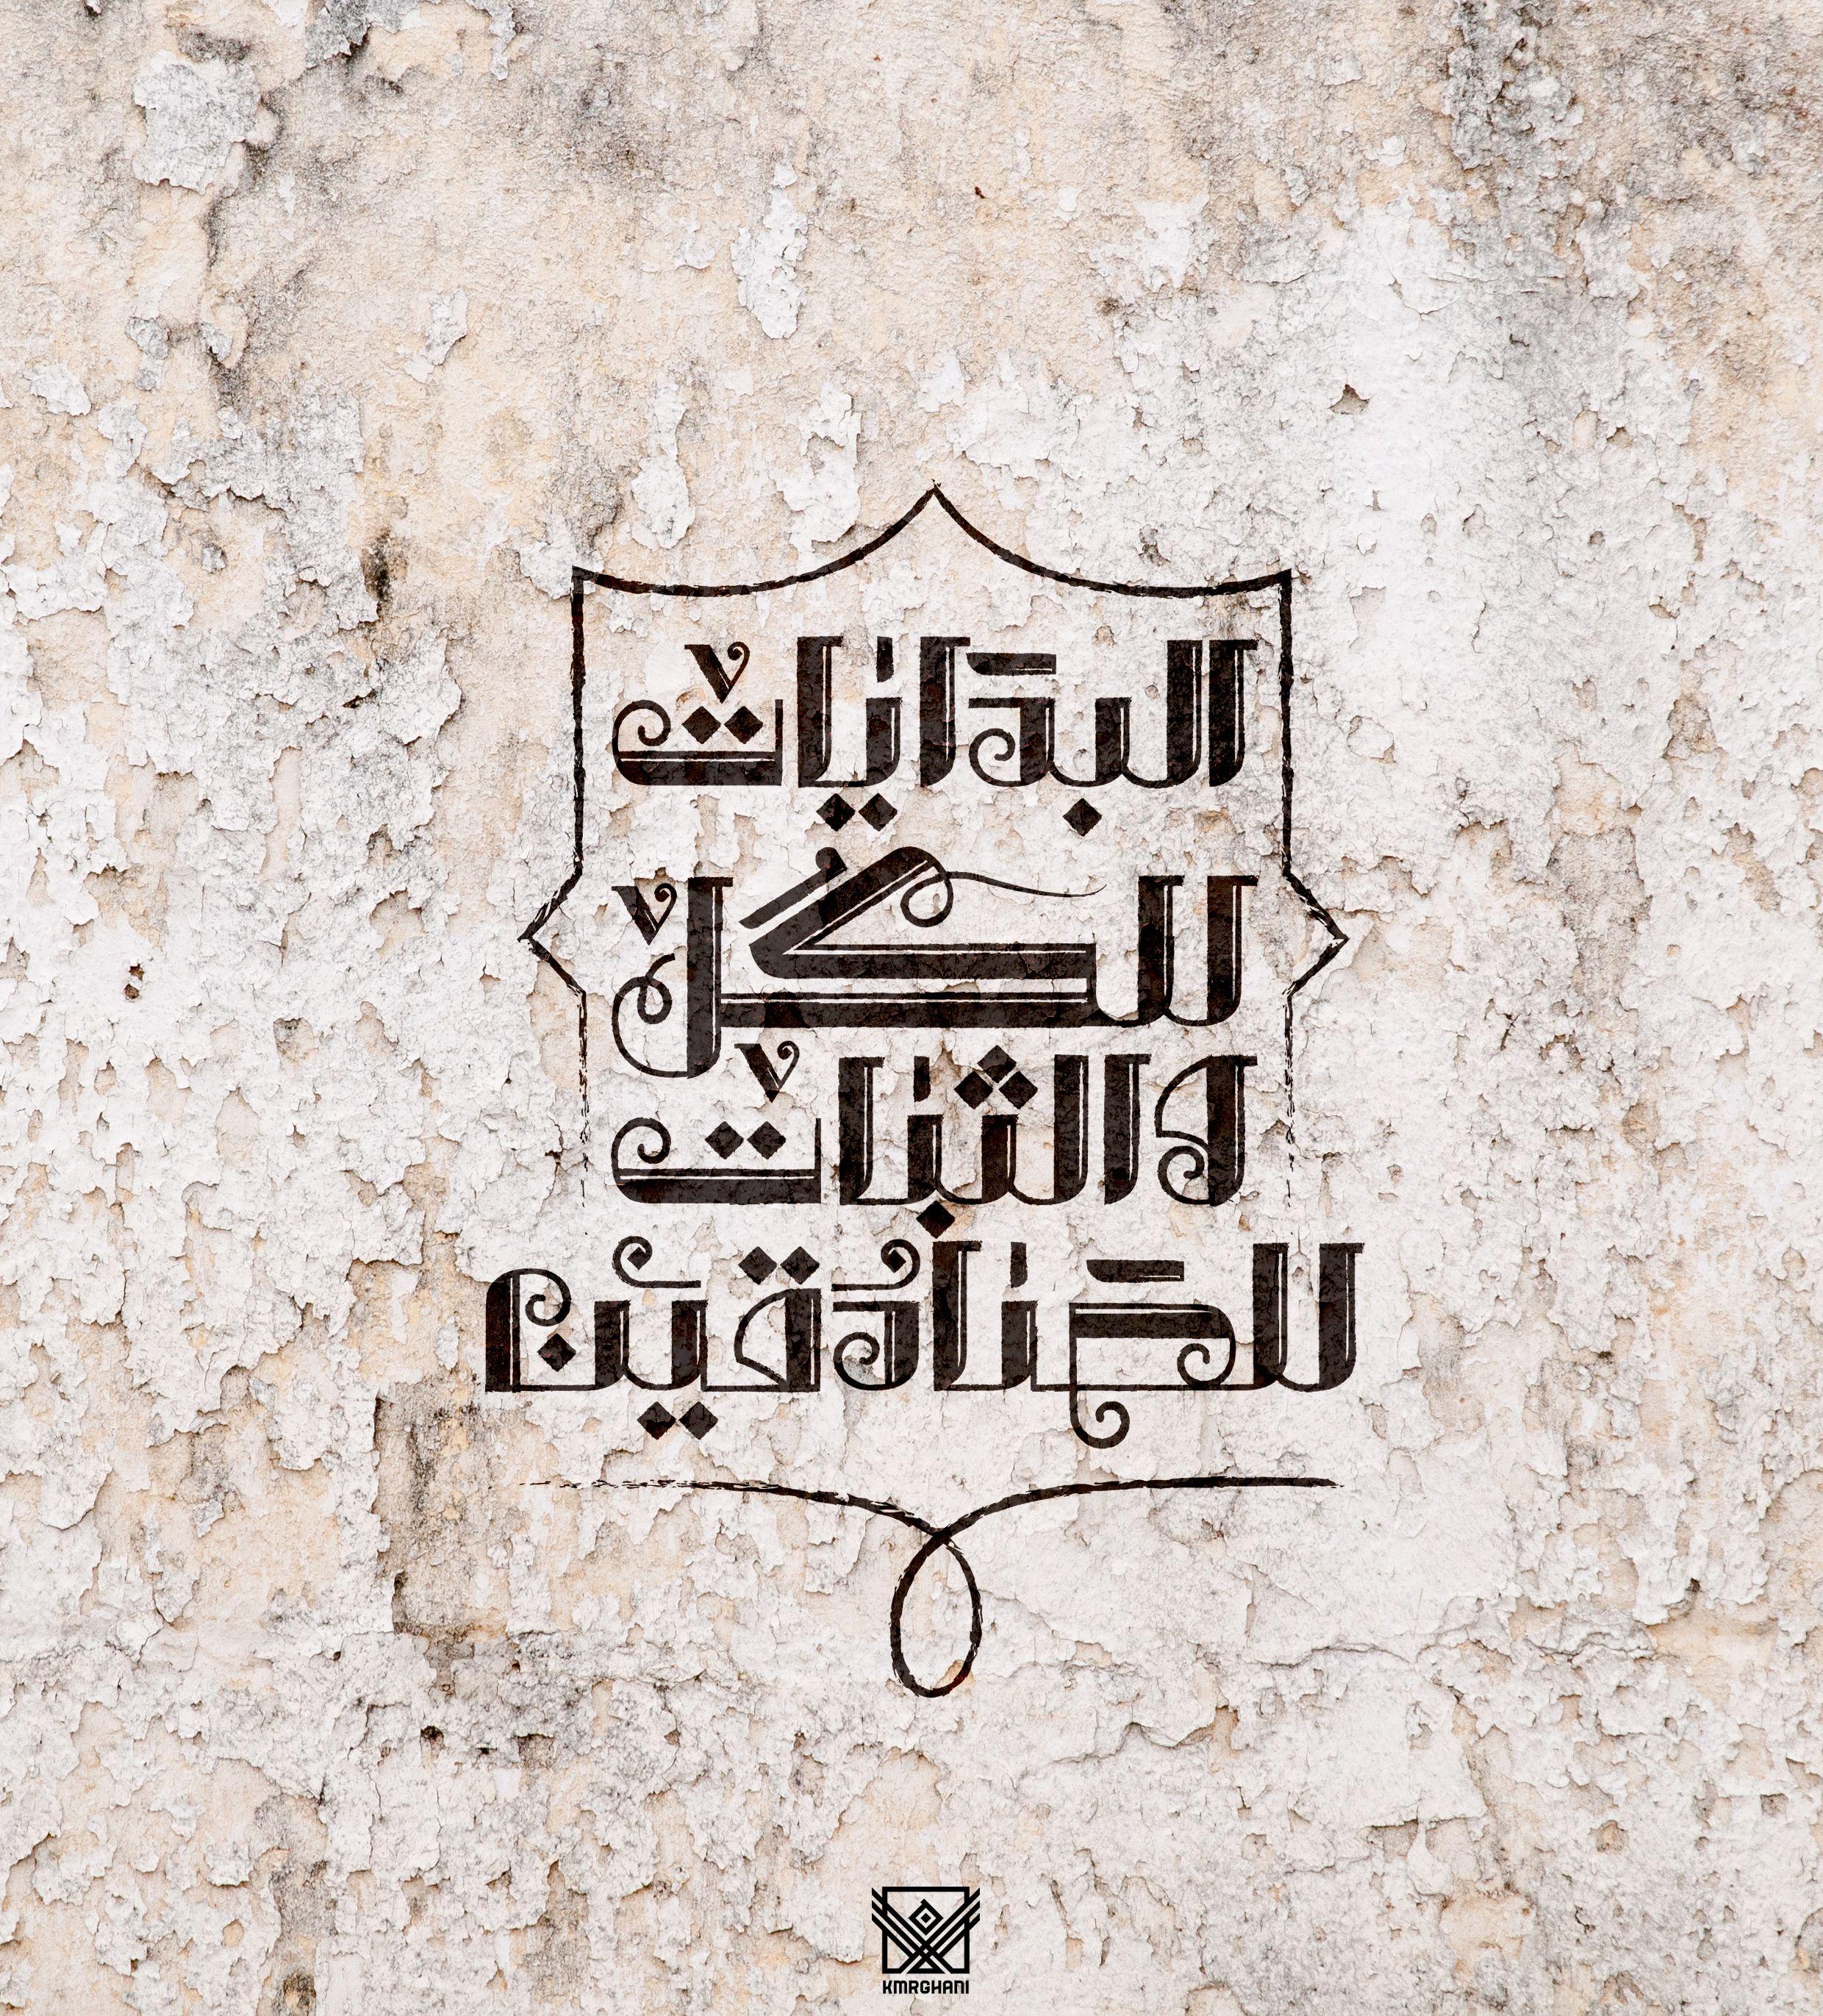 Dekor Salfetok Poisk V Google Arabic Calligraphy Calligraphy Pluto The Dog